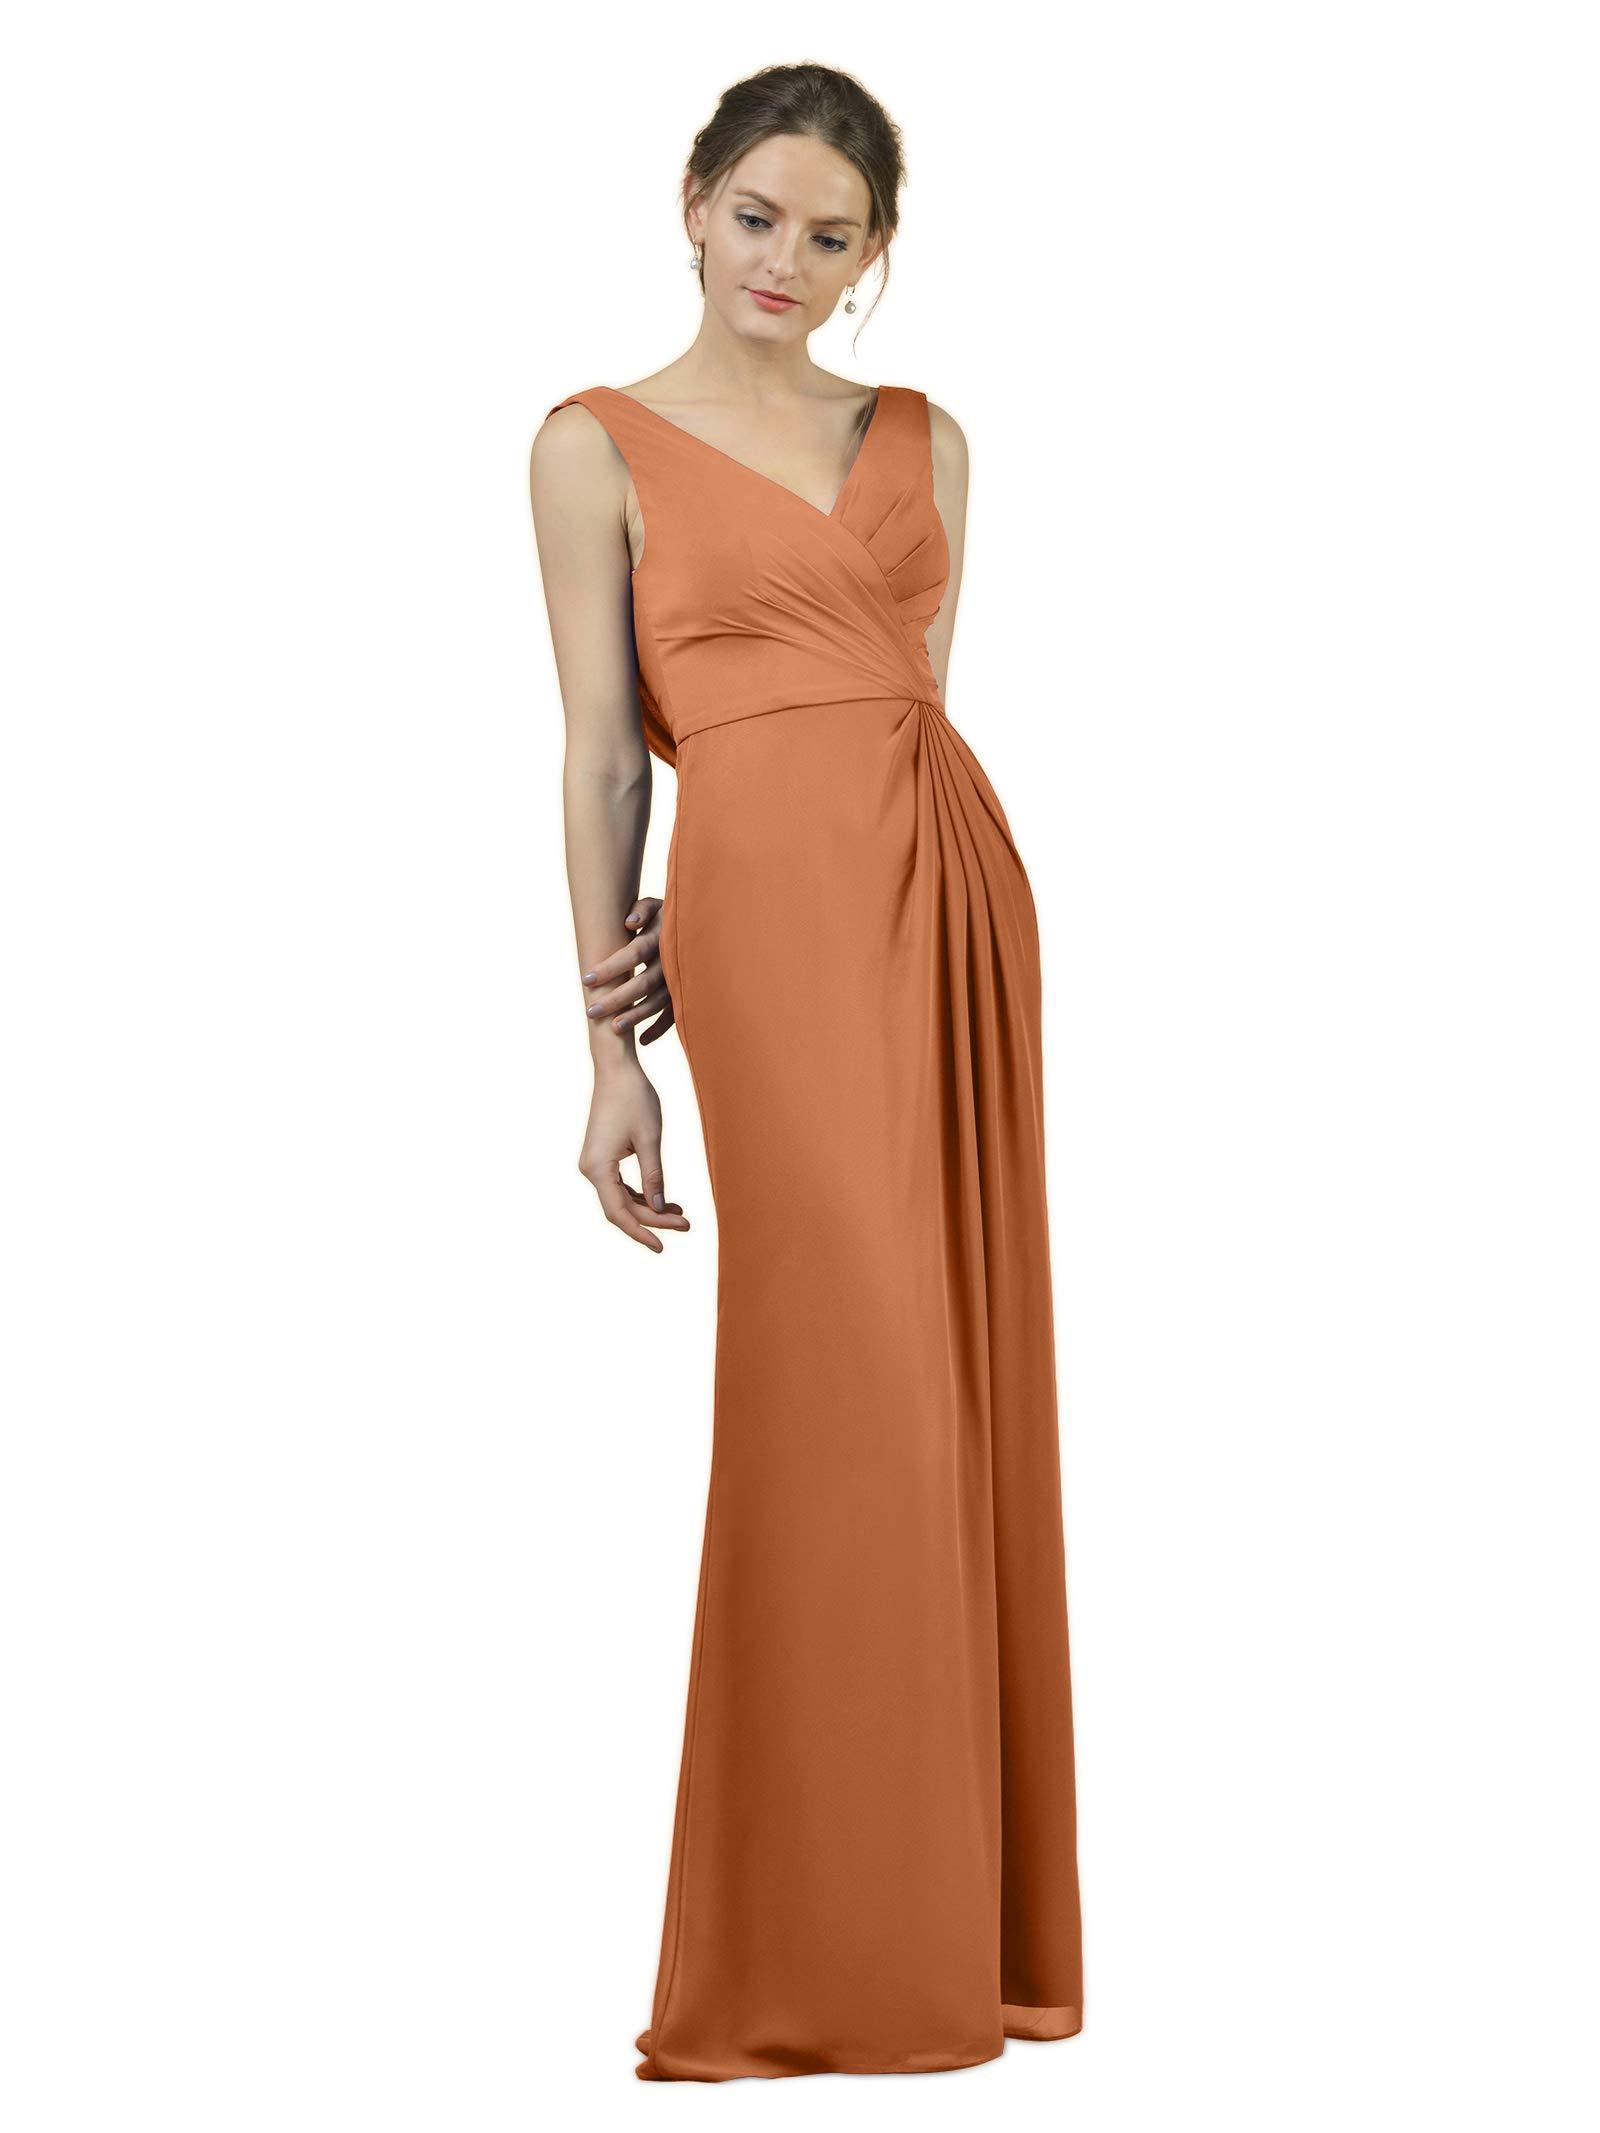 ed1168b41 Alicepub Long Bridesmaid Dresses Mermaid Elegant Maxi Dress Formal Evening  Prom Gown, Burnt Orange, US14